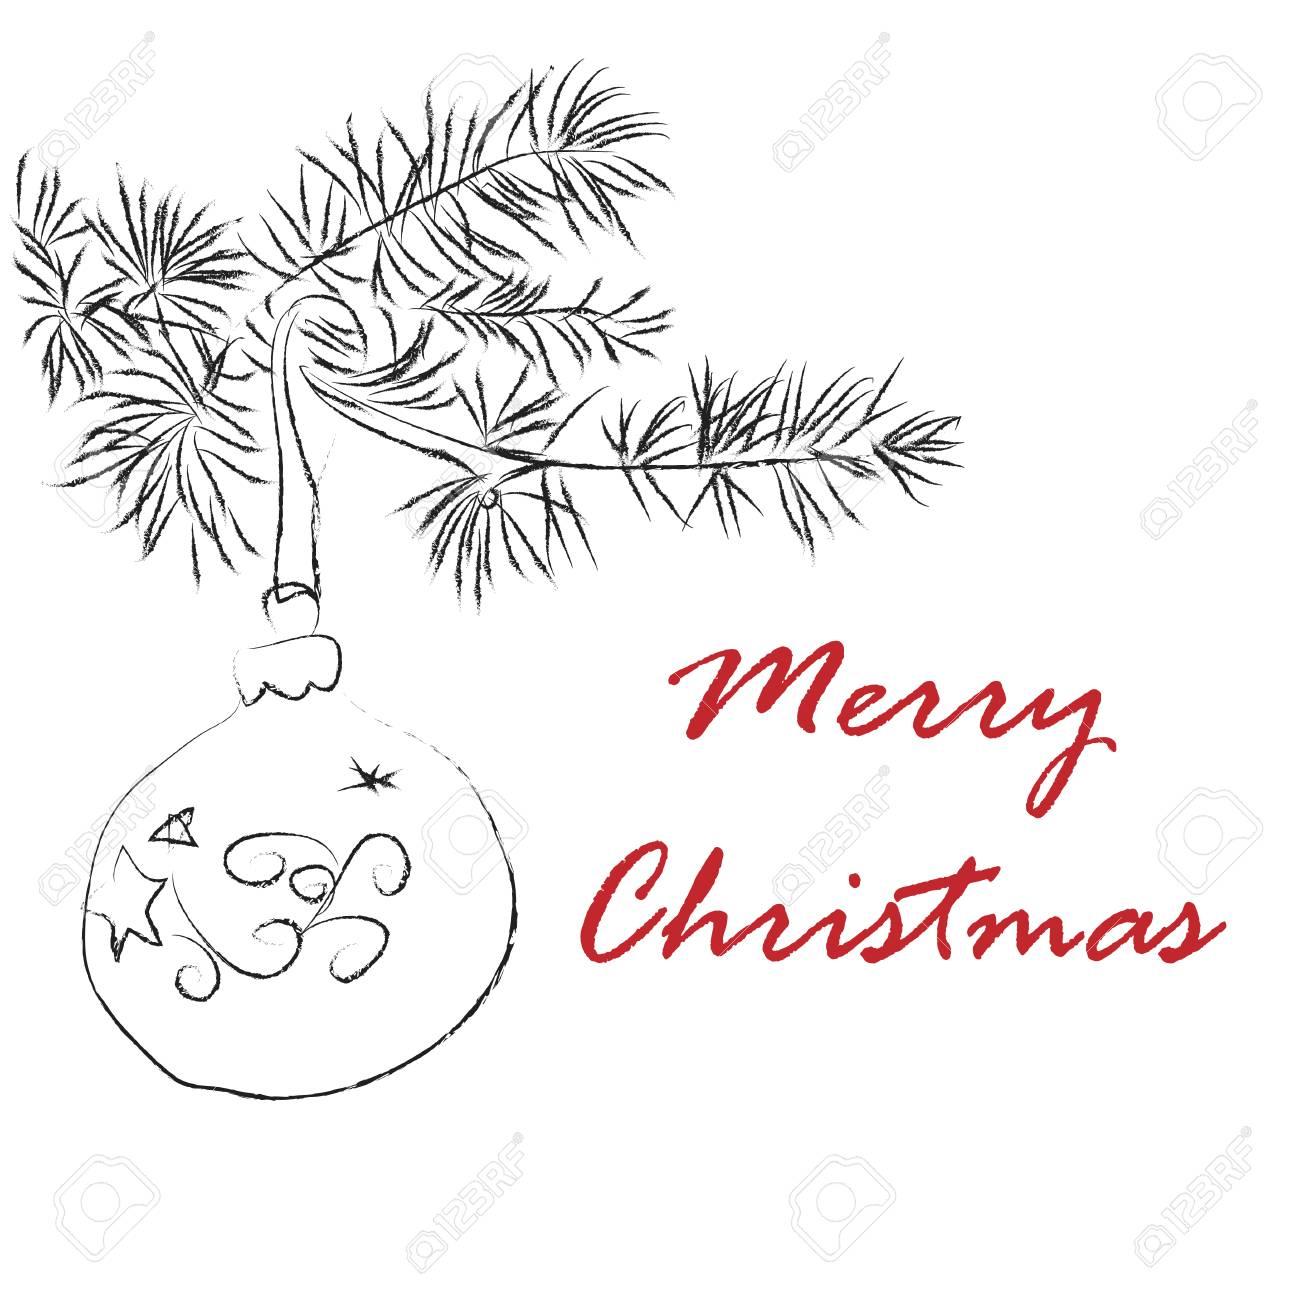 Seasons greetings card with handdrawn christmas ball on a fir seasons greetings card with handdrawn christmas ball on a fir branch card for winter holidays m4hsunfo